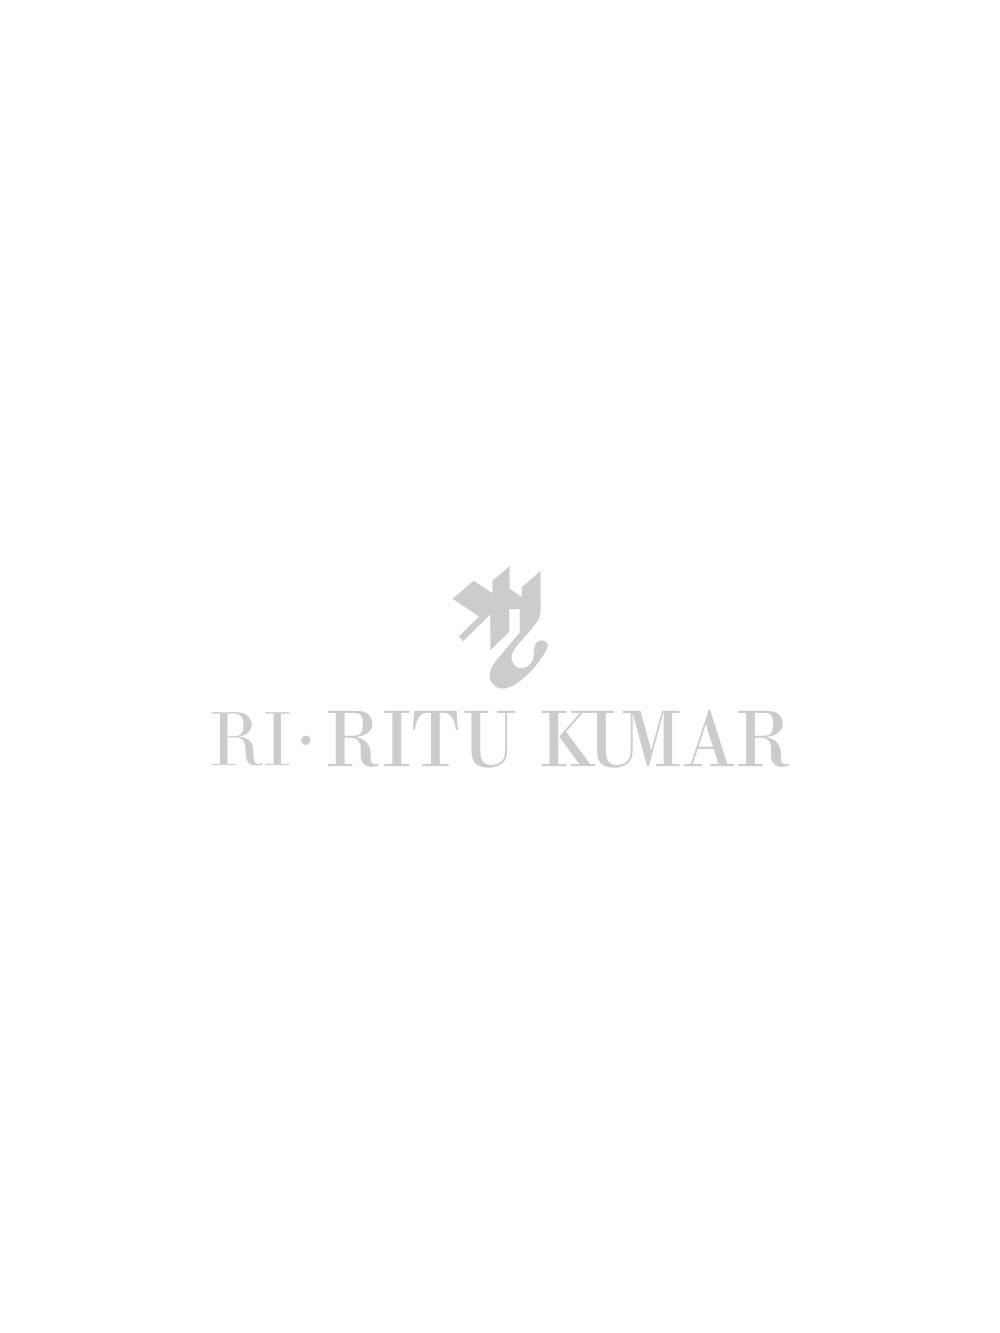 Black & Khaki Embroidered Double Layered Kurta With Dupatta And Palazzo